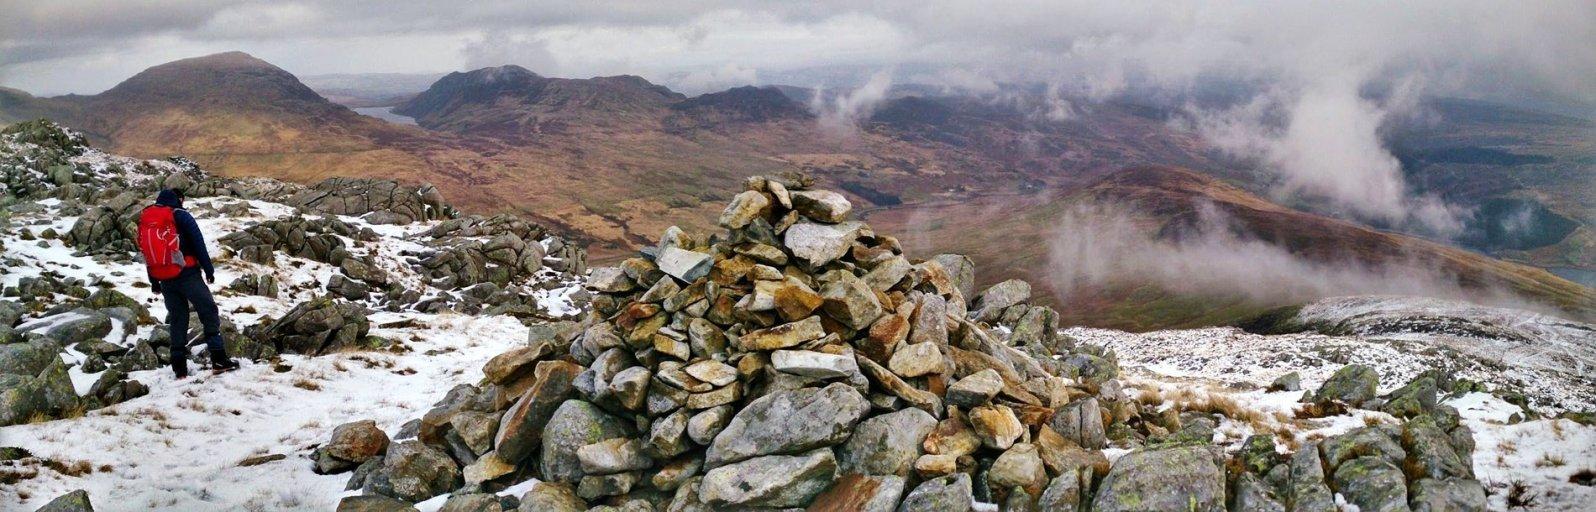 Summit panorama from Gallt yr Ogof.